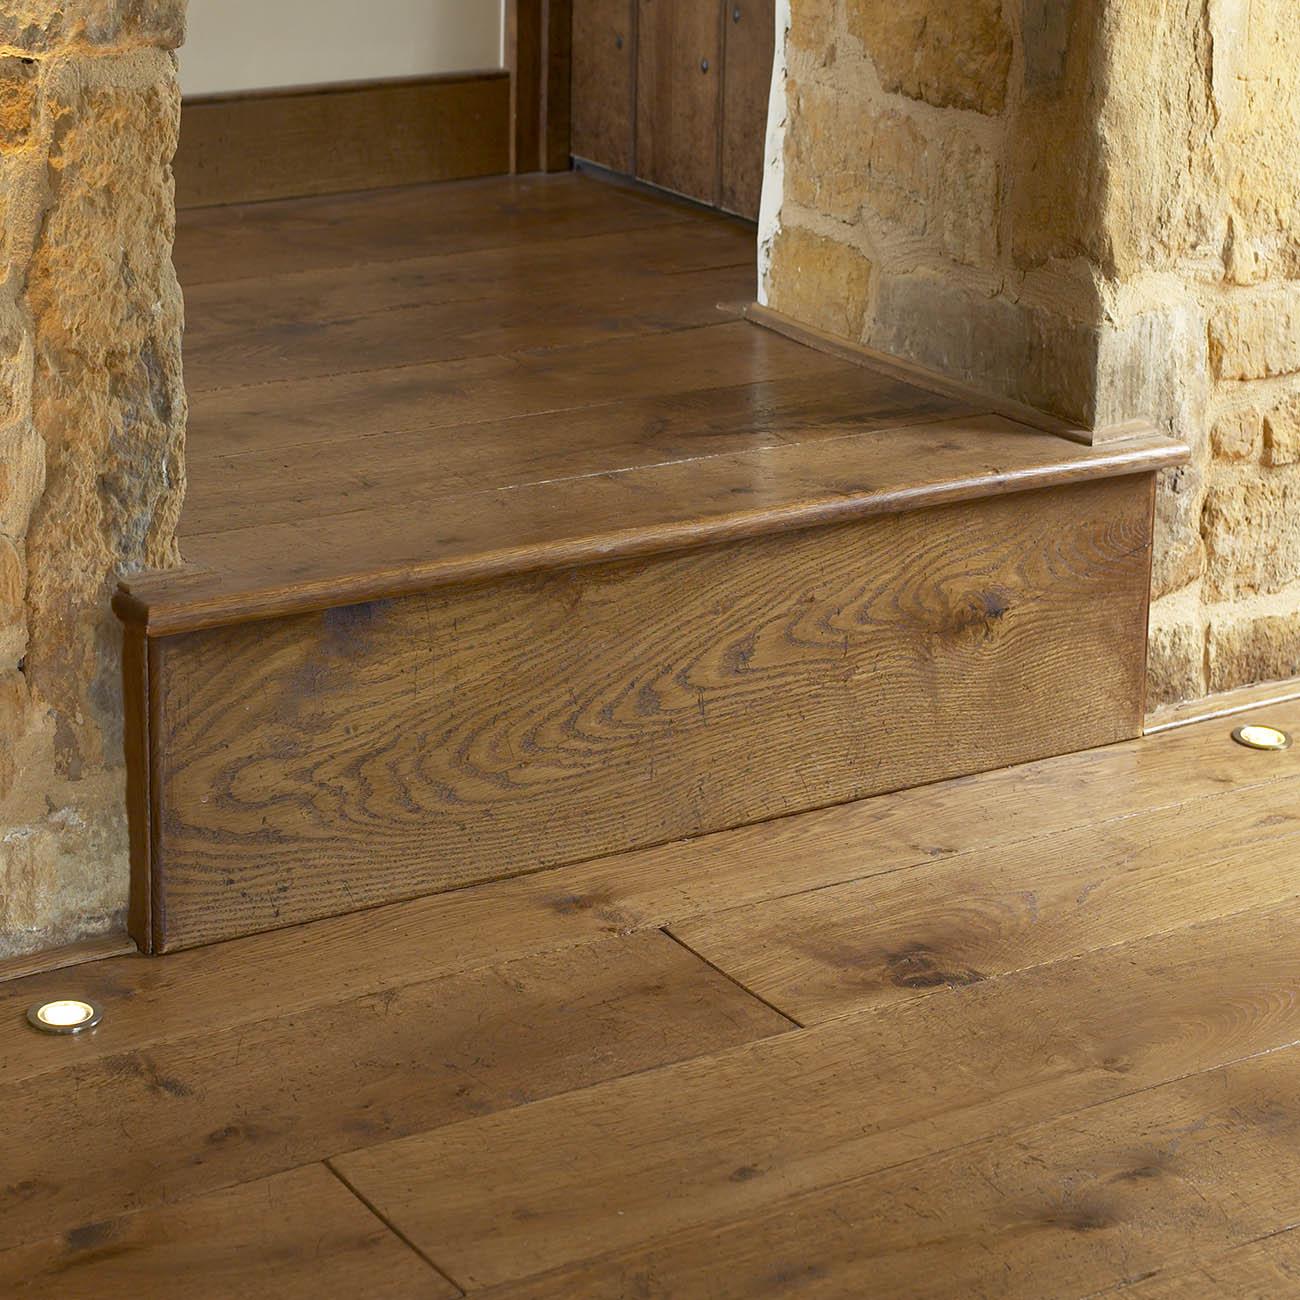 8 Generations alternative to reclaimed wood floor.jpg